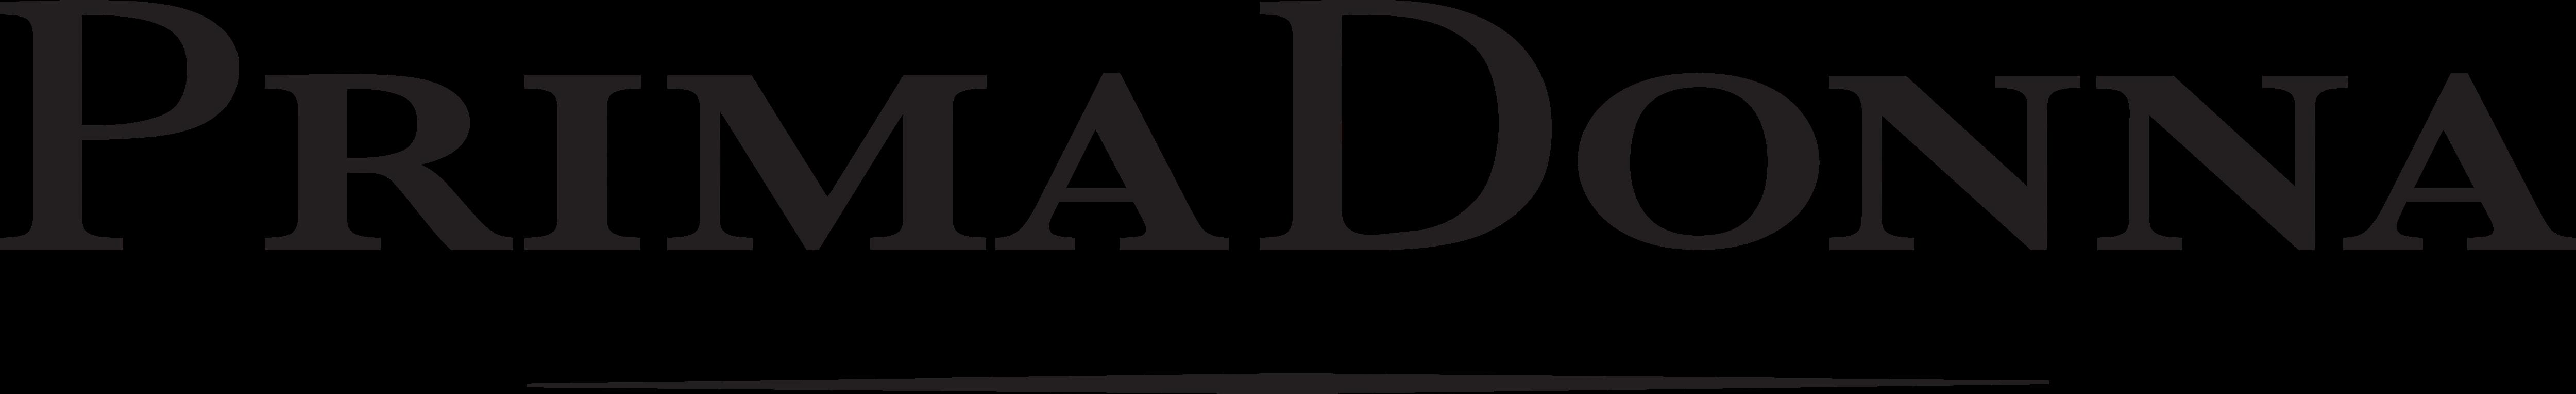 Primadonna_Logo